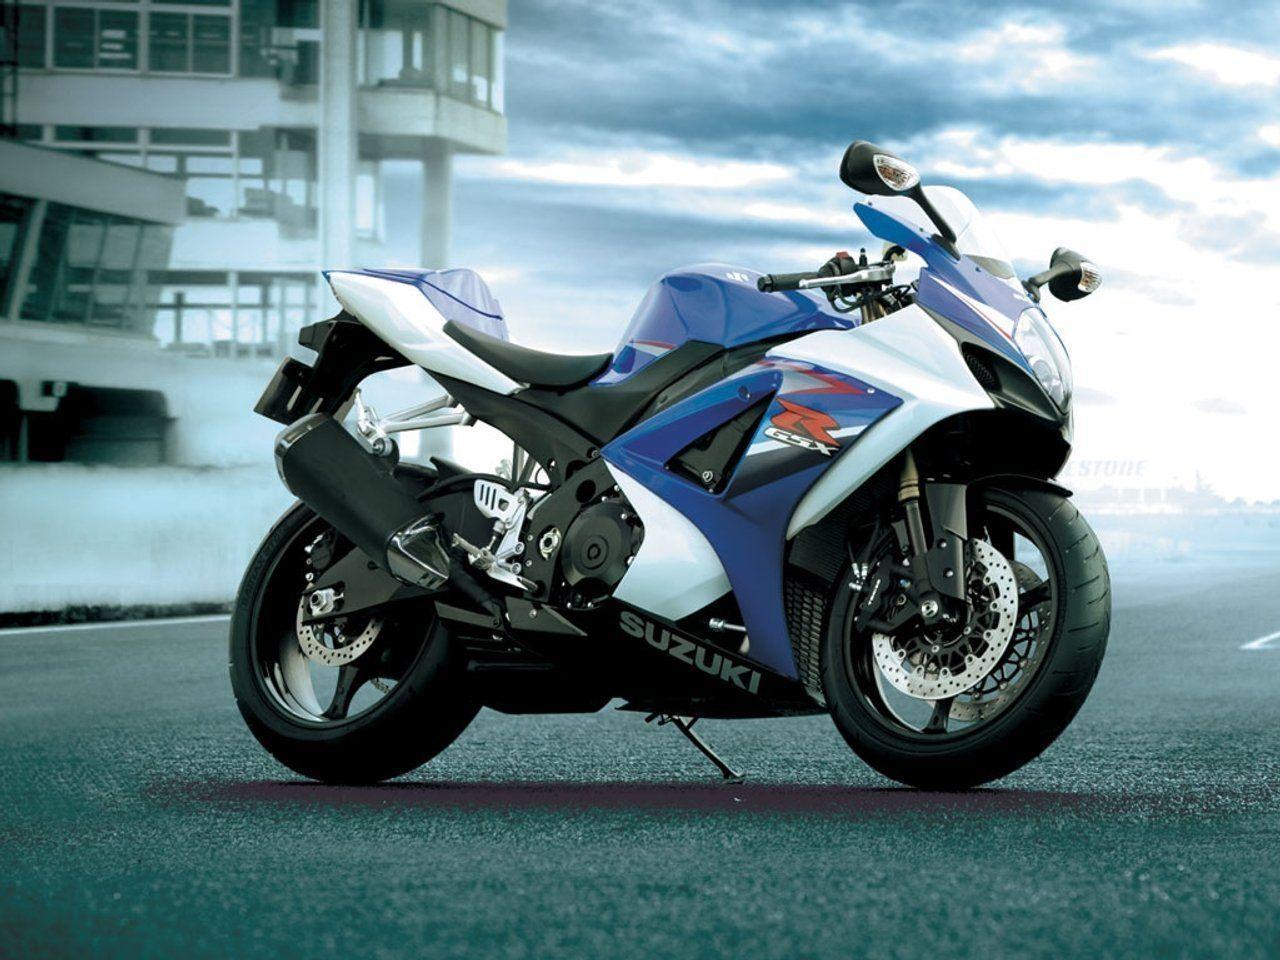 08 Suzuki Gsxr 1000 Wallpaper | PicsWallpaper.